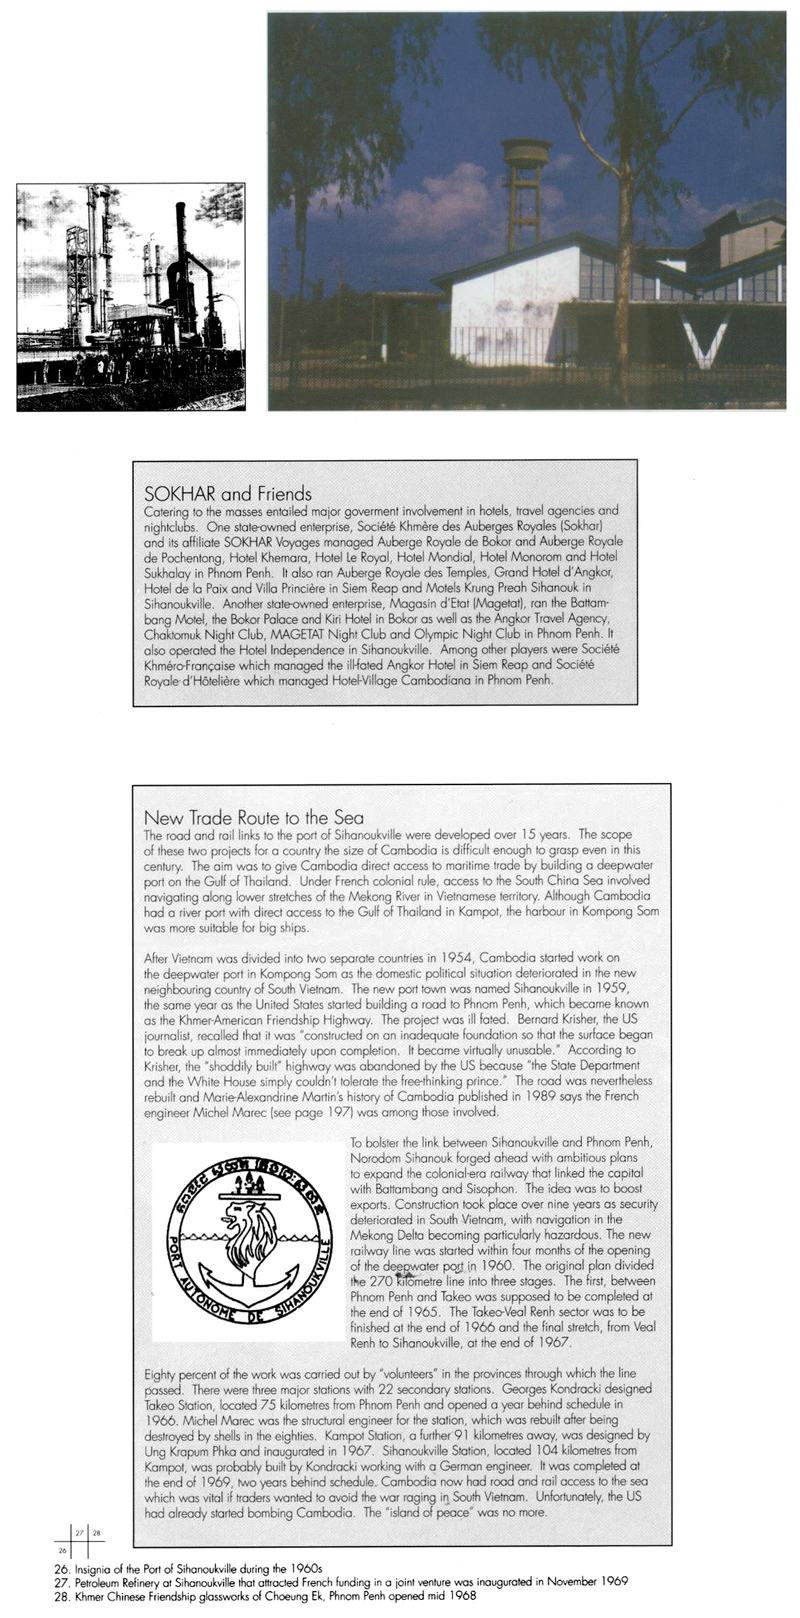 All/document/Documents/BuildingCambodia/BuildingCambodia/id826/photo002.jpg